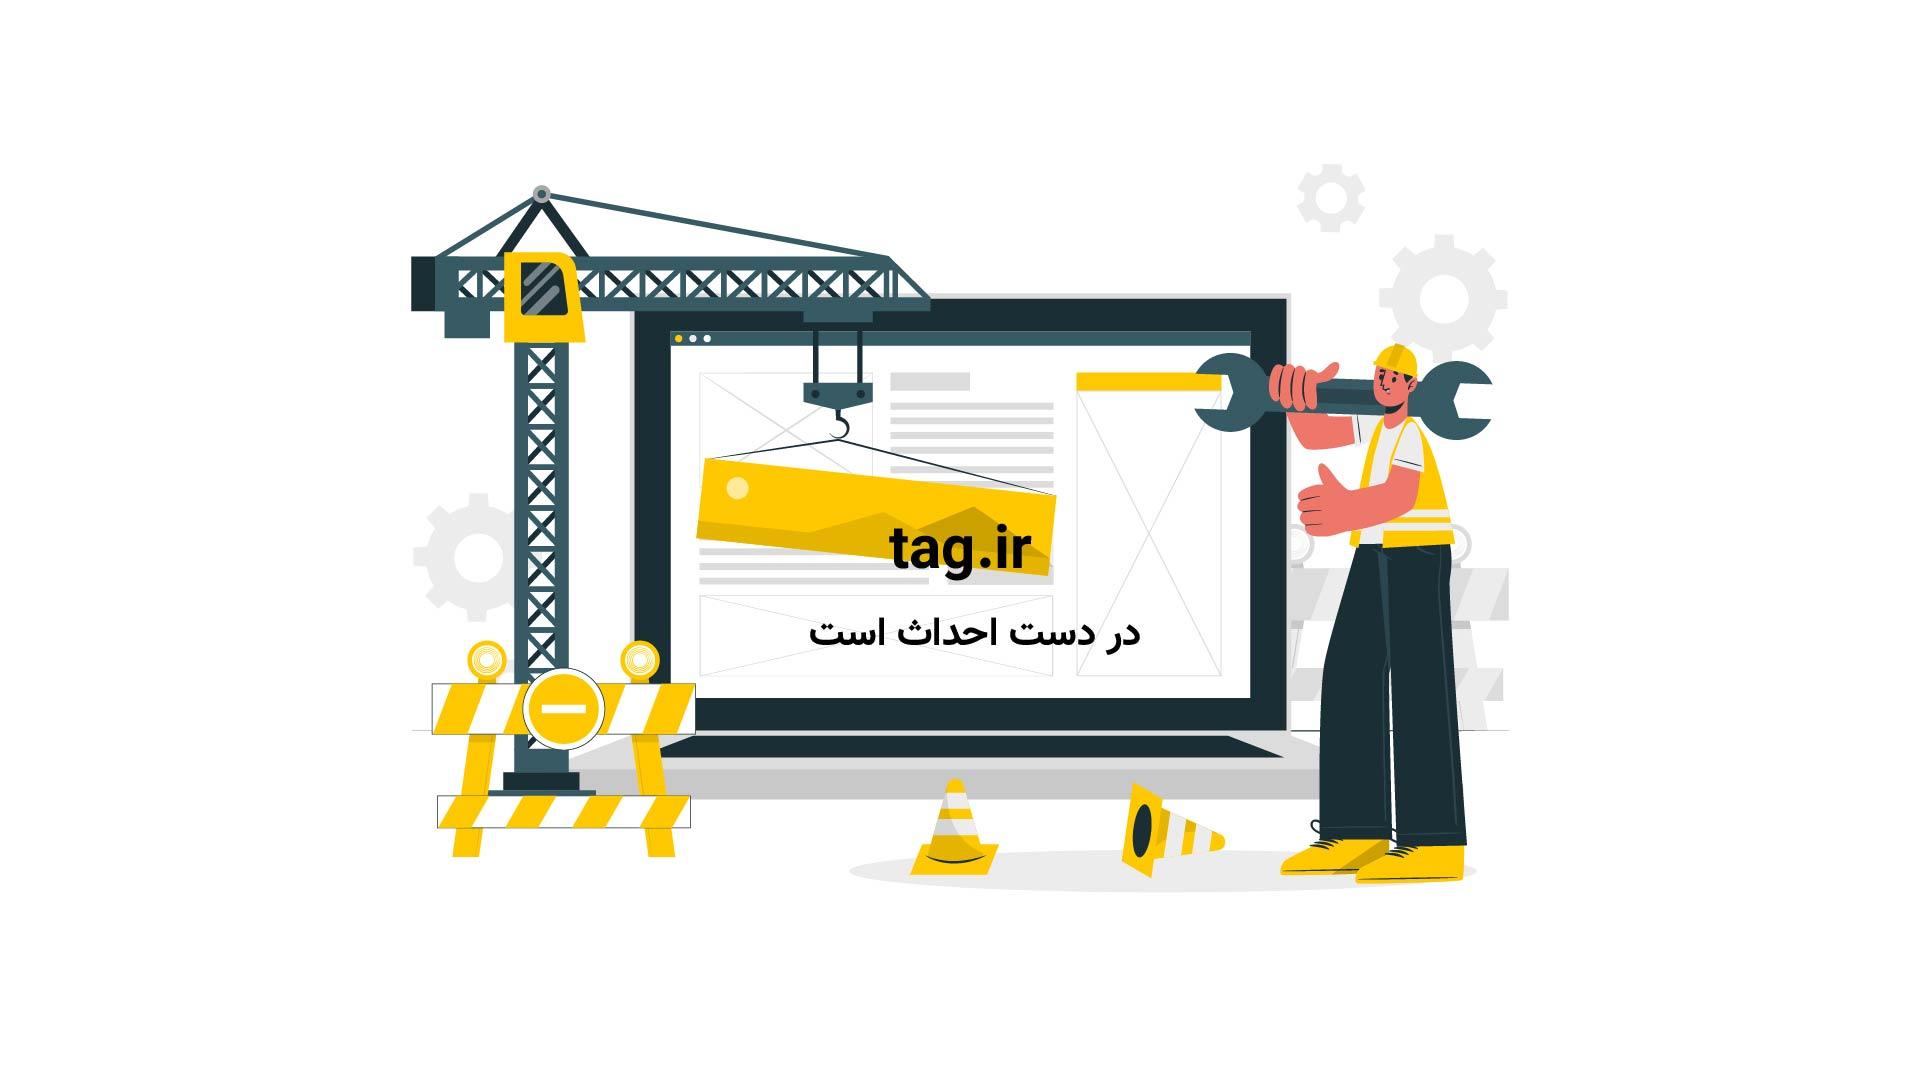 نقاشی پلیکان